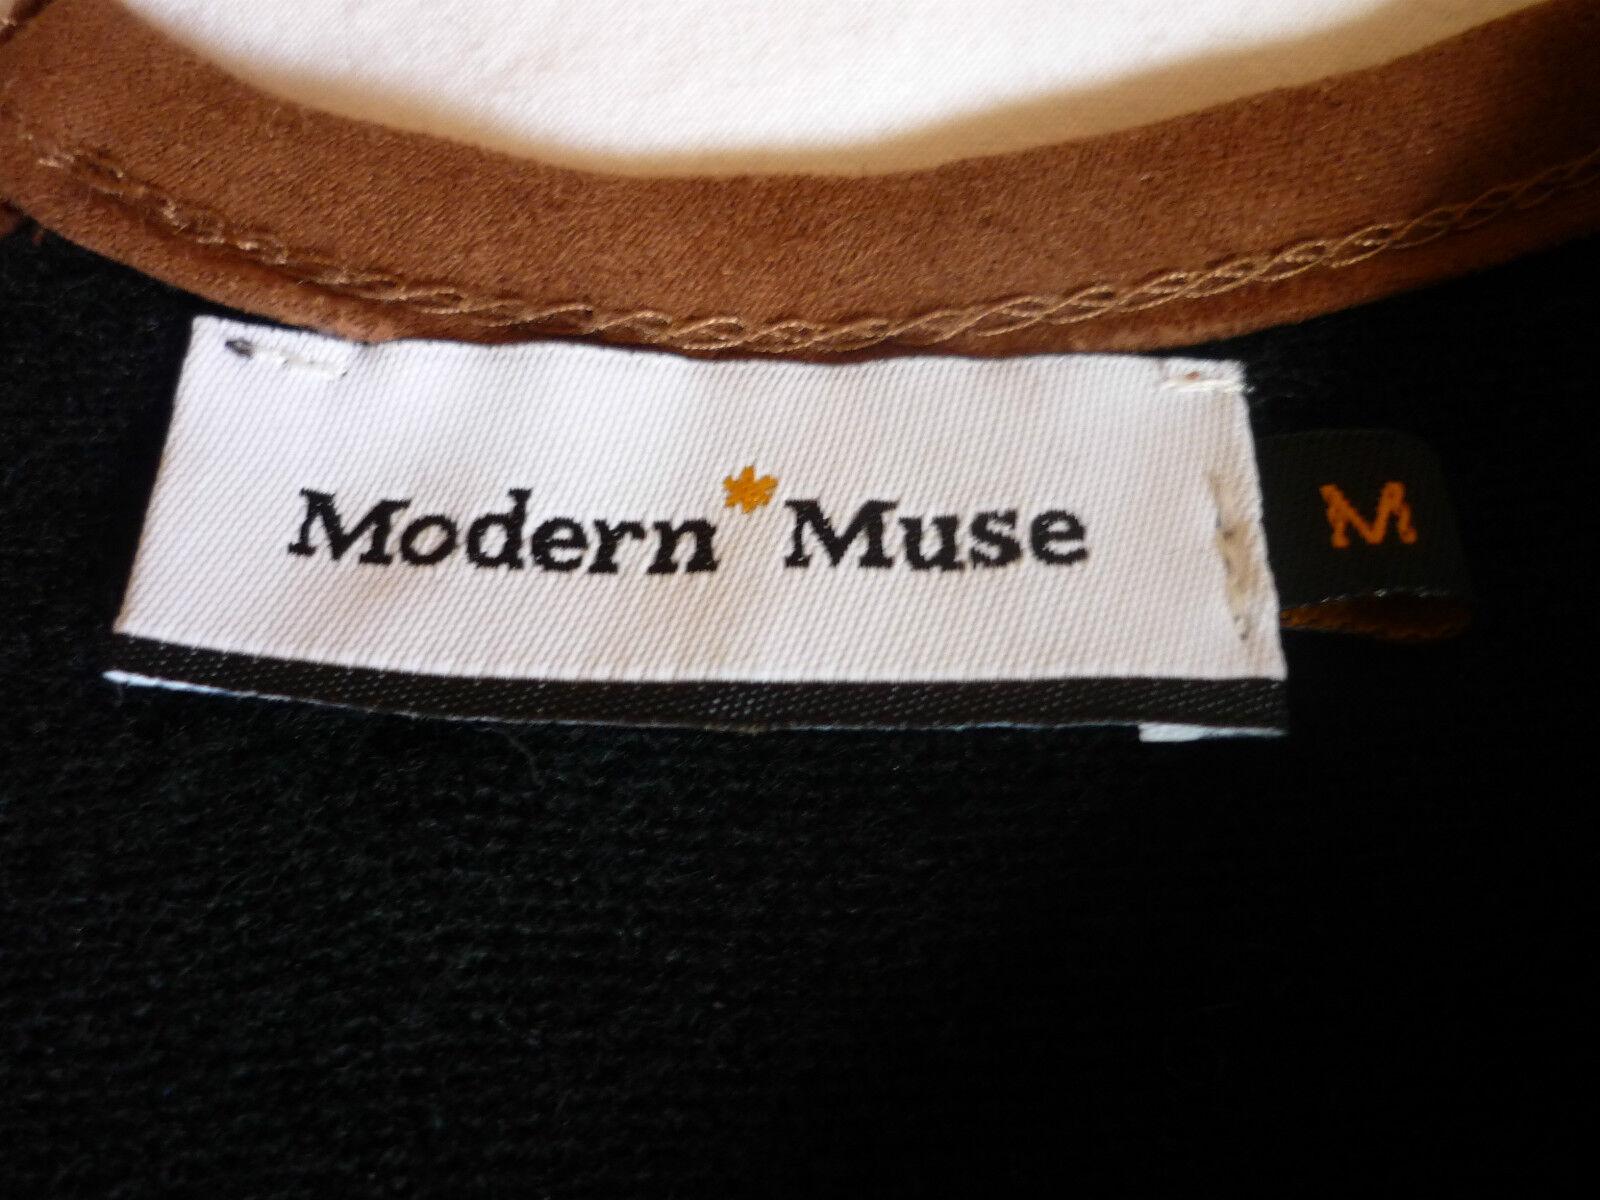 MODERN MUSE Taille - Pull-tunique en laine noir - Taille MUSE M 223754